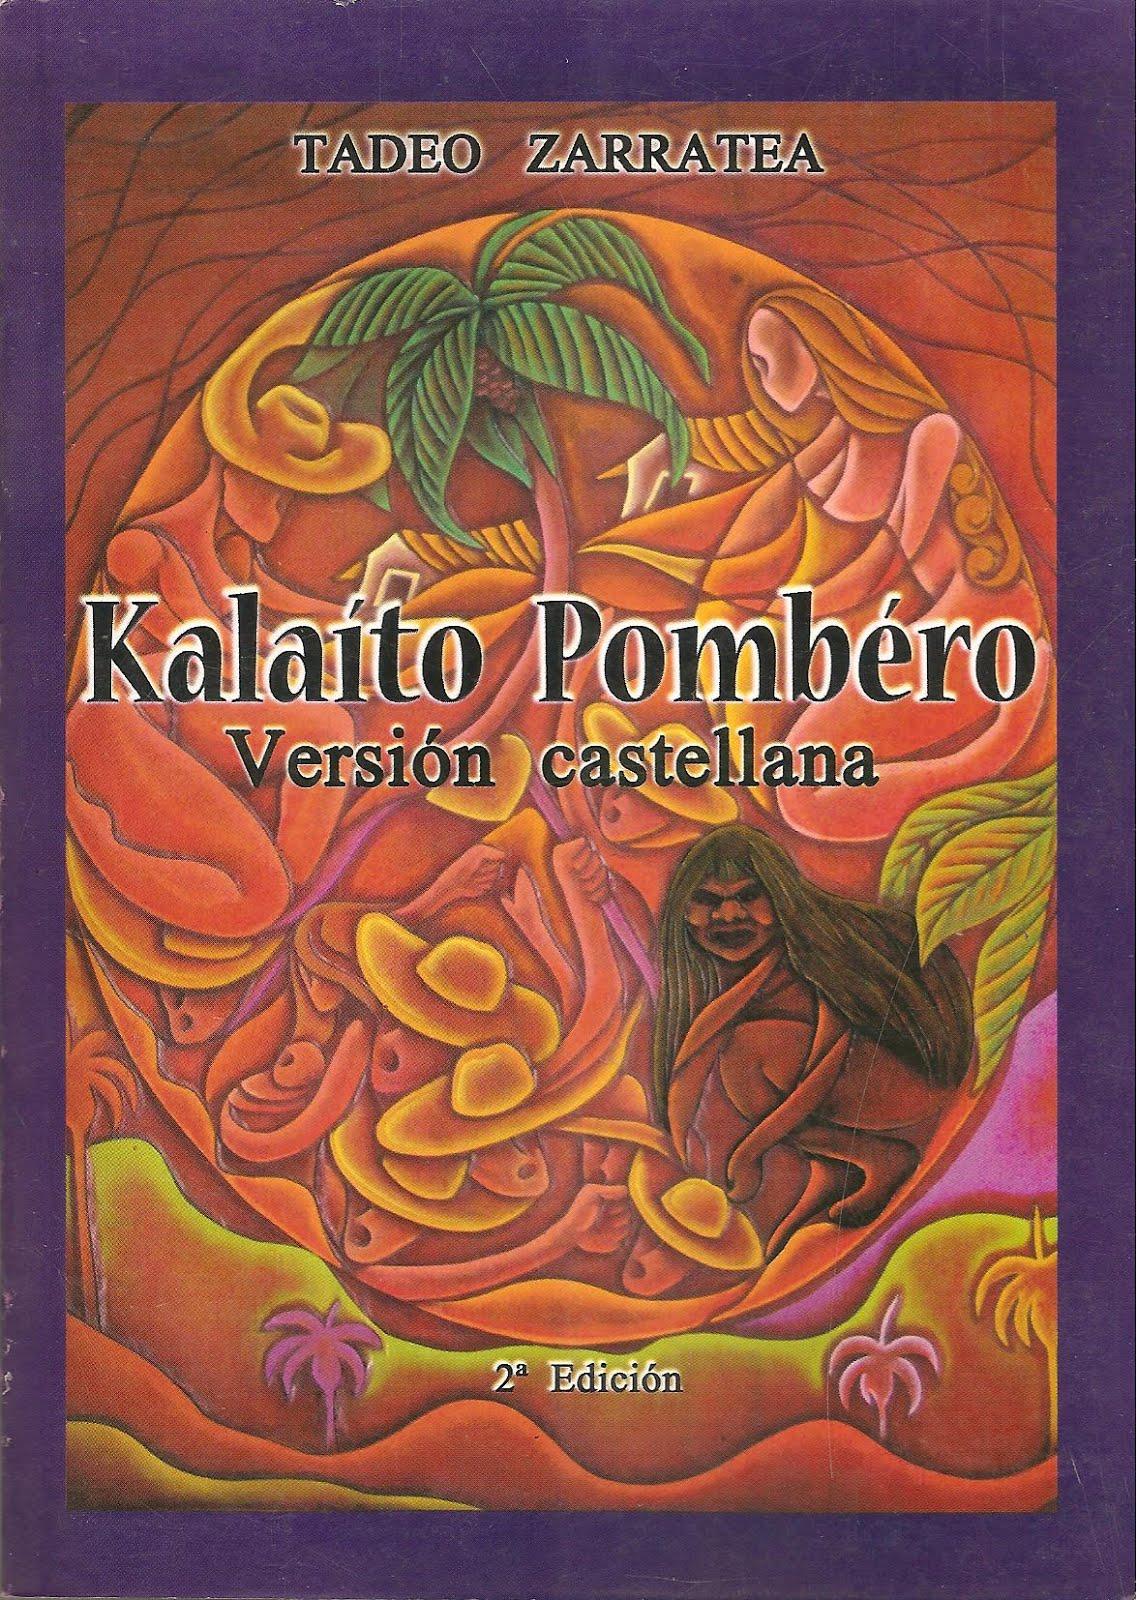 Novela de Tadeo Zarratea